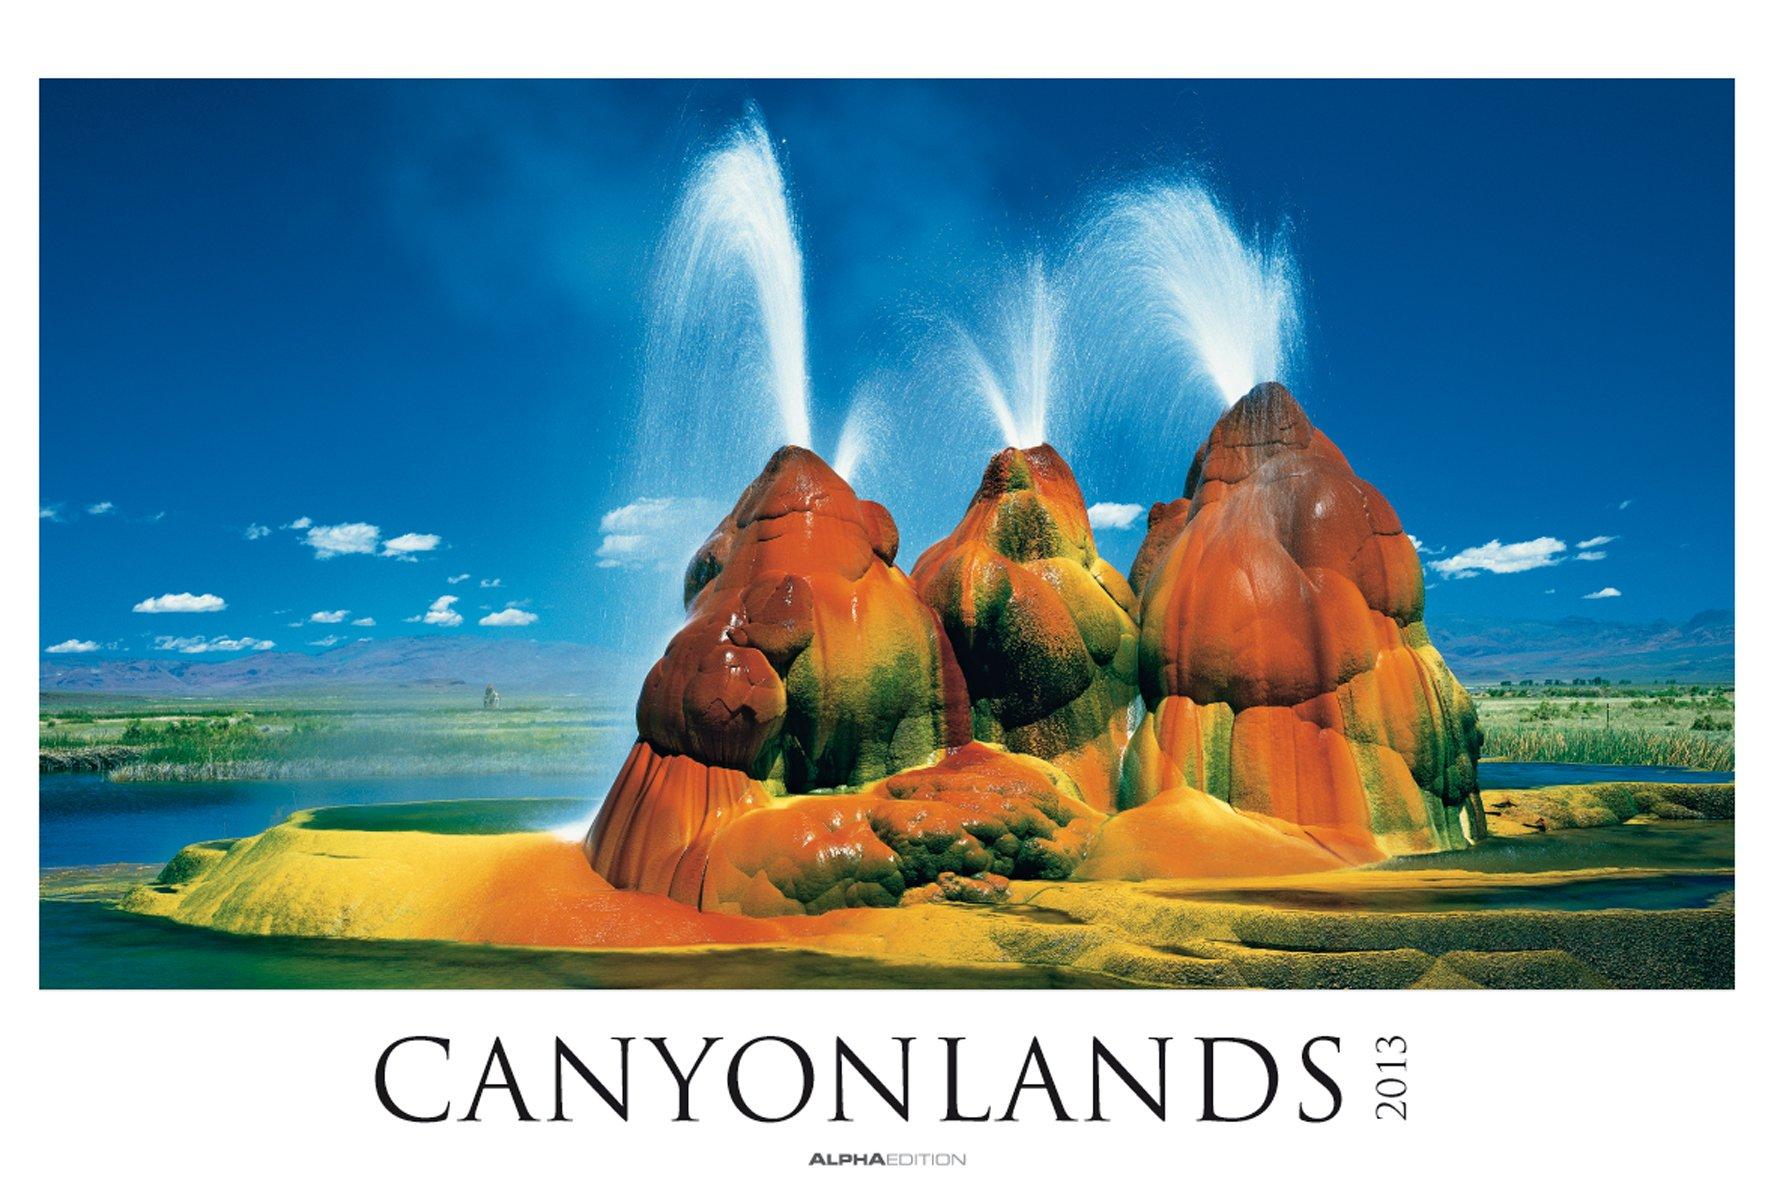 Canyonlands, Bildkalender 2013